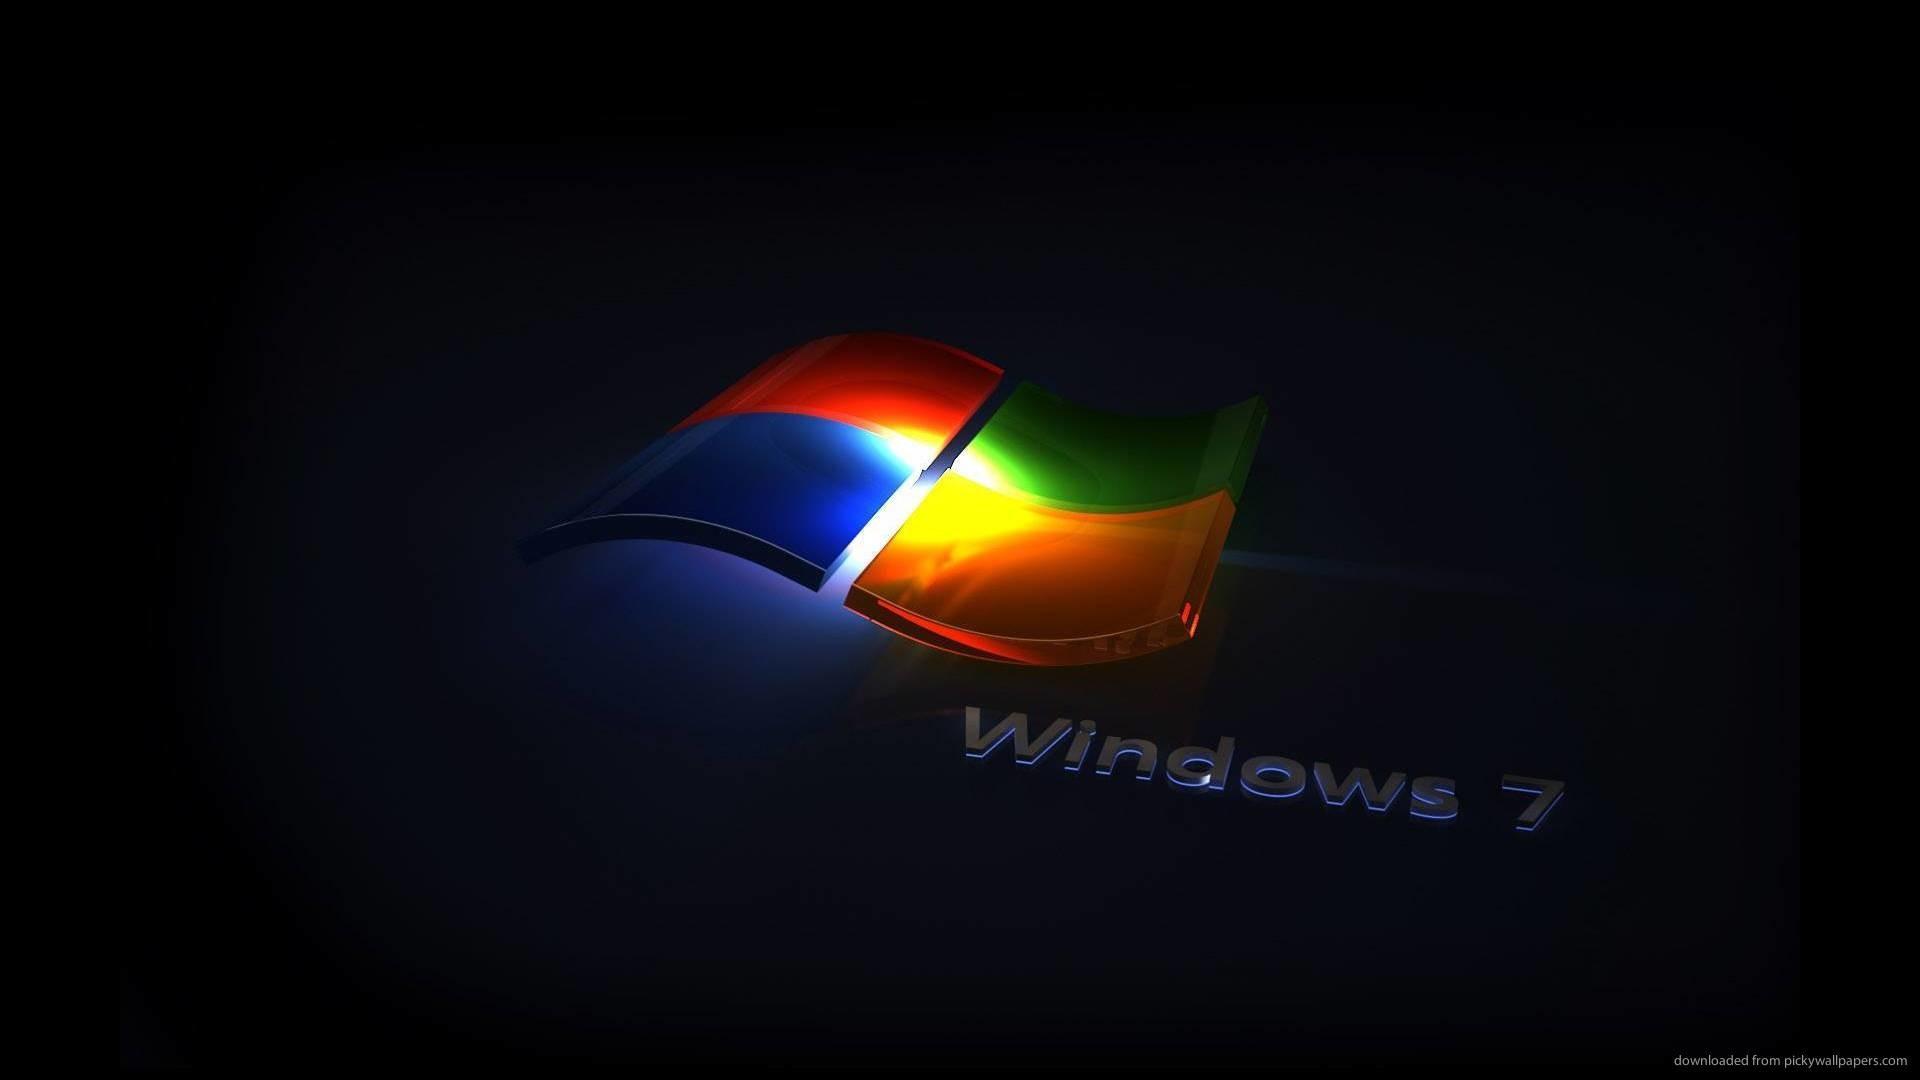 Windows 7 Wallpaper Hd 1920x1080 54 Images